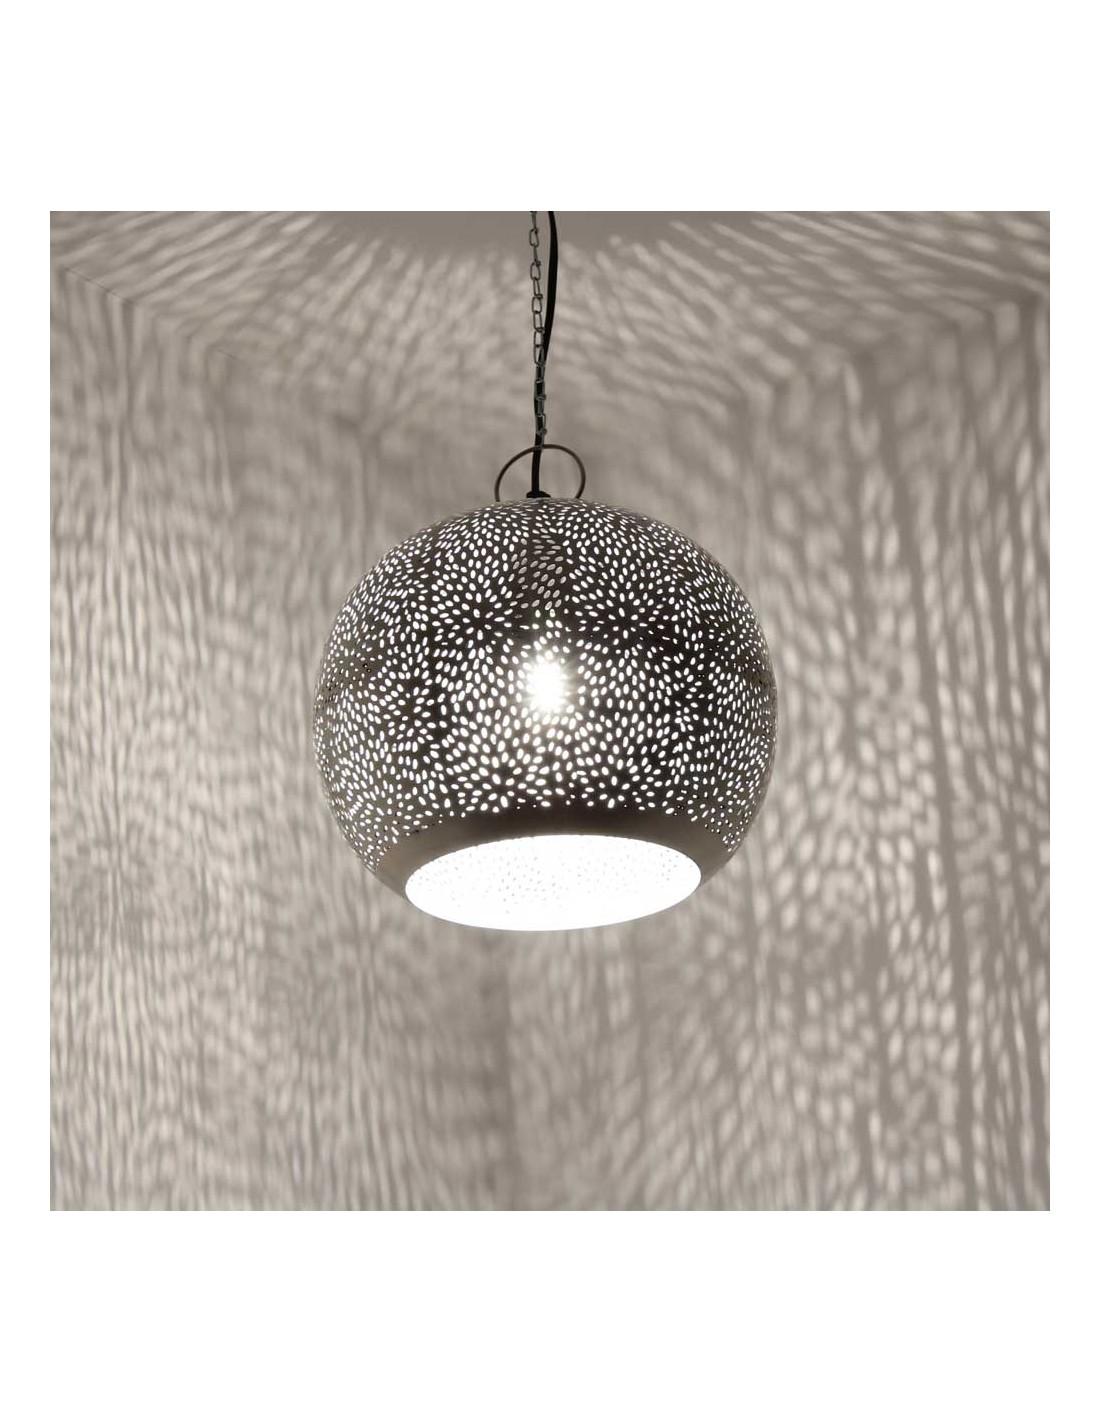 orientalische h ngelampe jandra 29cm in silber albena shop. Black Bedroom Furniture Sets. Home Design Ideas